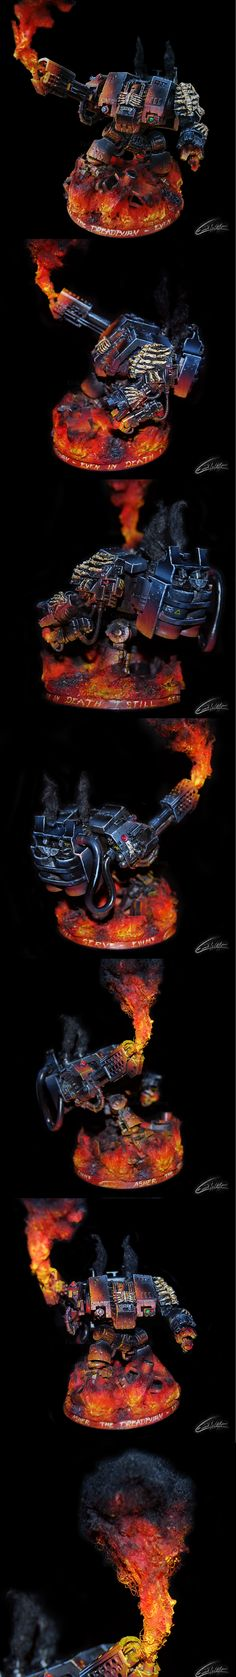 "Dreadnought Warhammer 40k E.W.M.F Painting ""Dreadburn - Asher"""